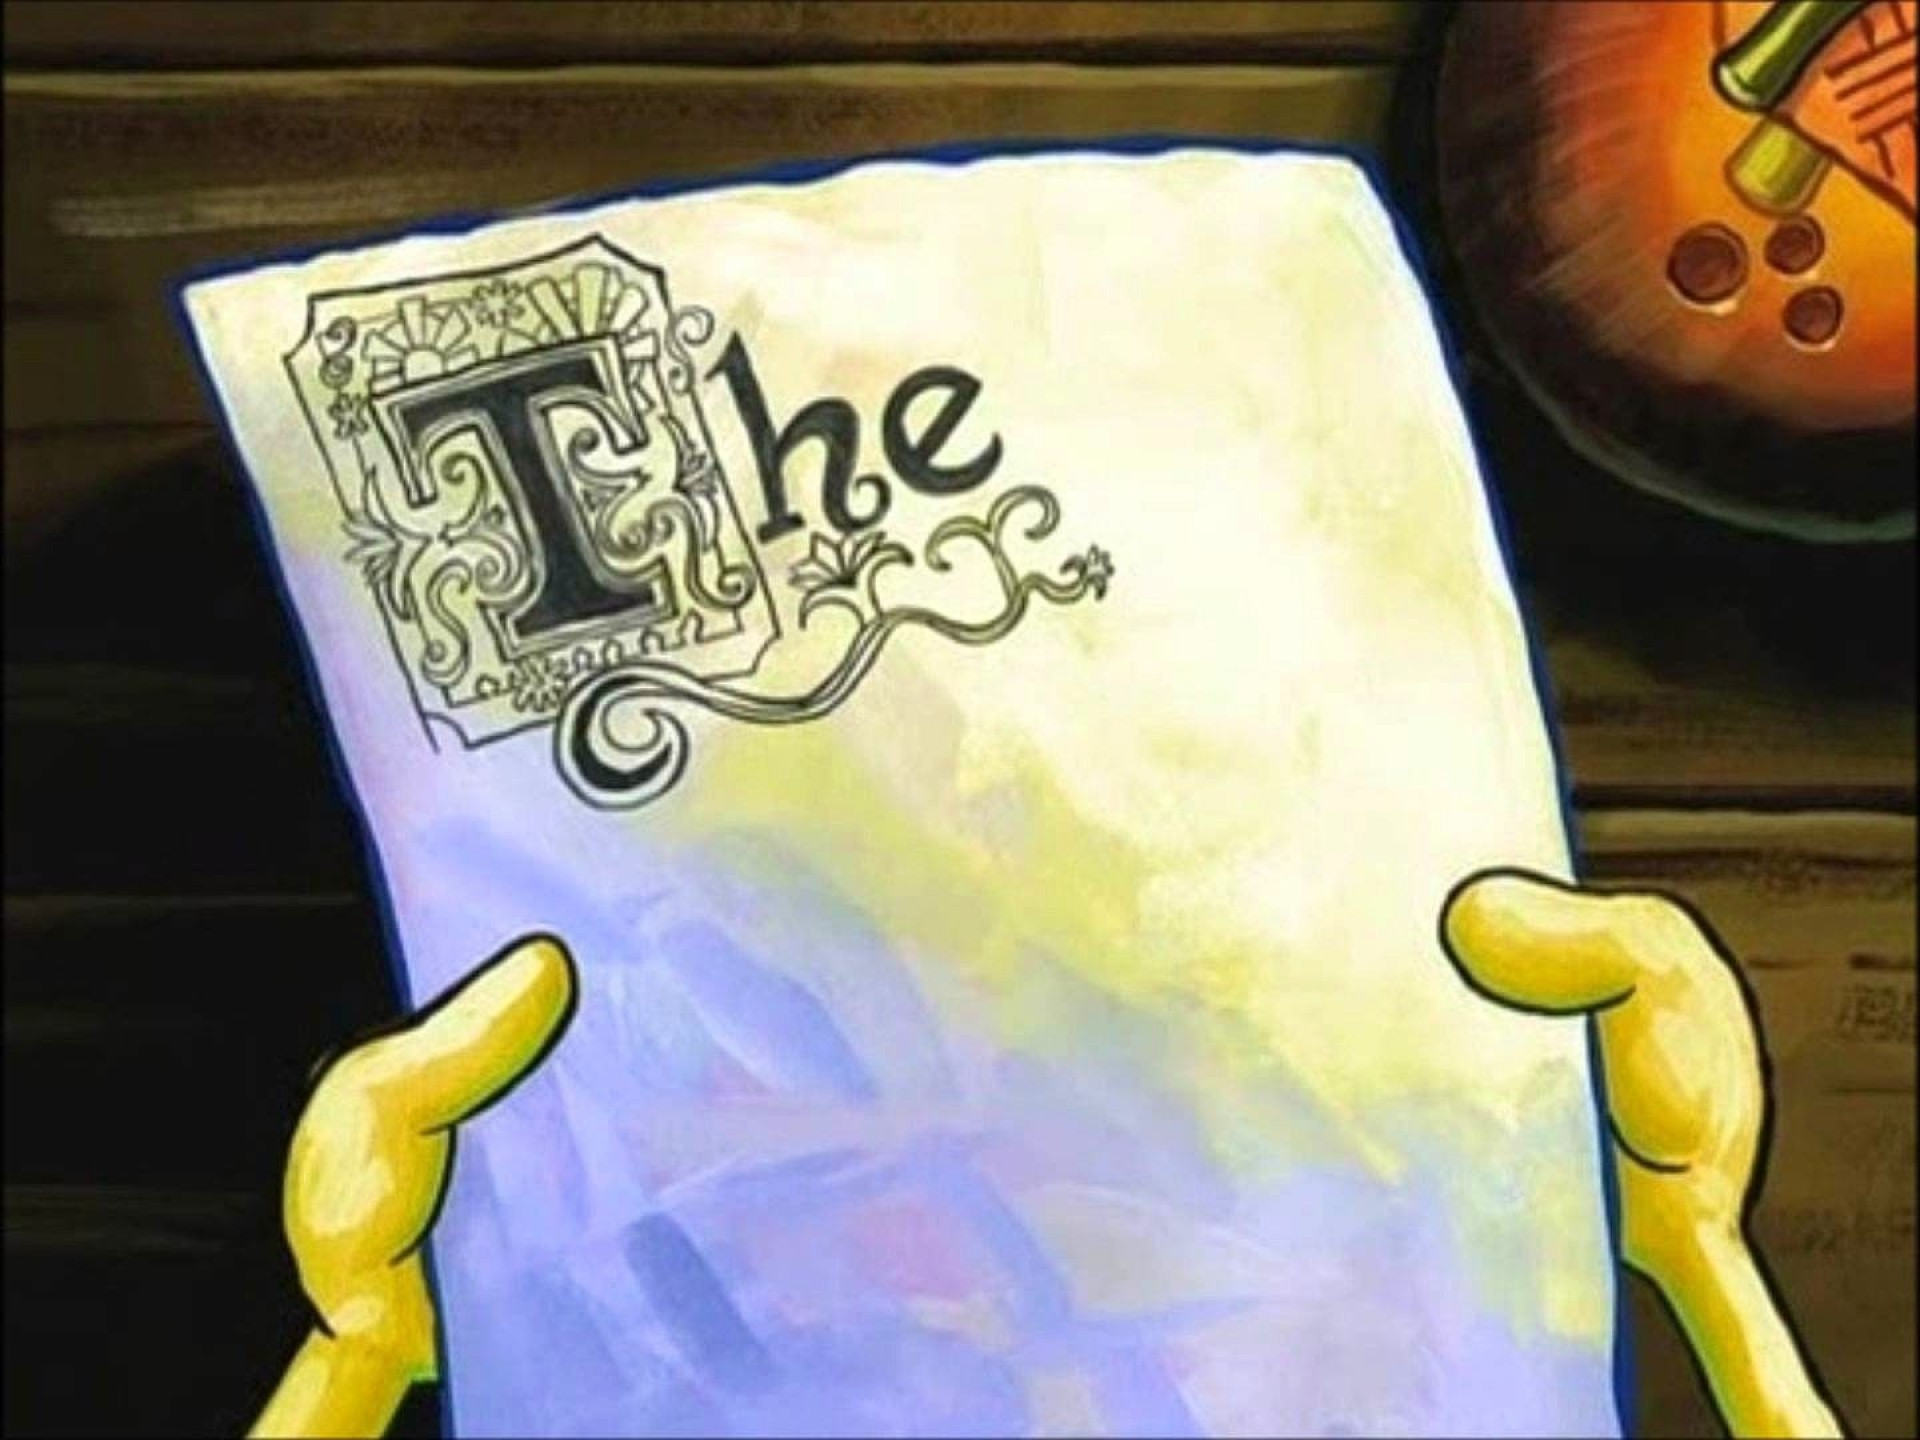 003 Essay Example Spongebob Unforgettable The Copy And Paste Meme Gif Tumblr 1920